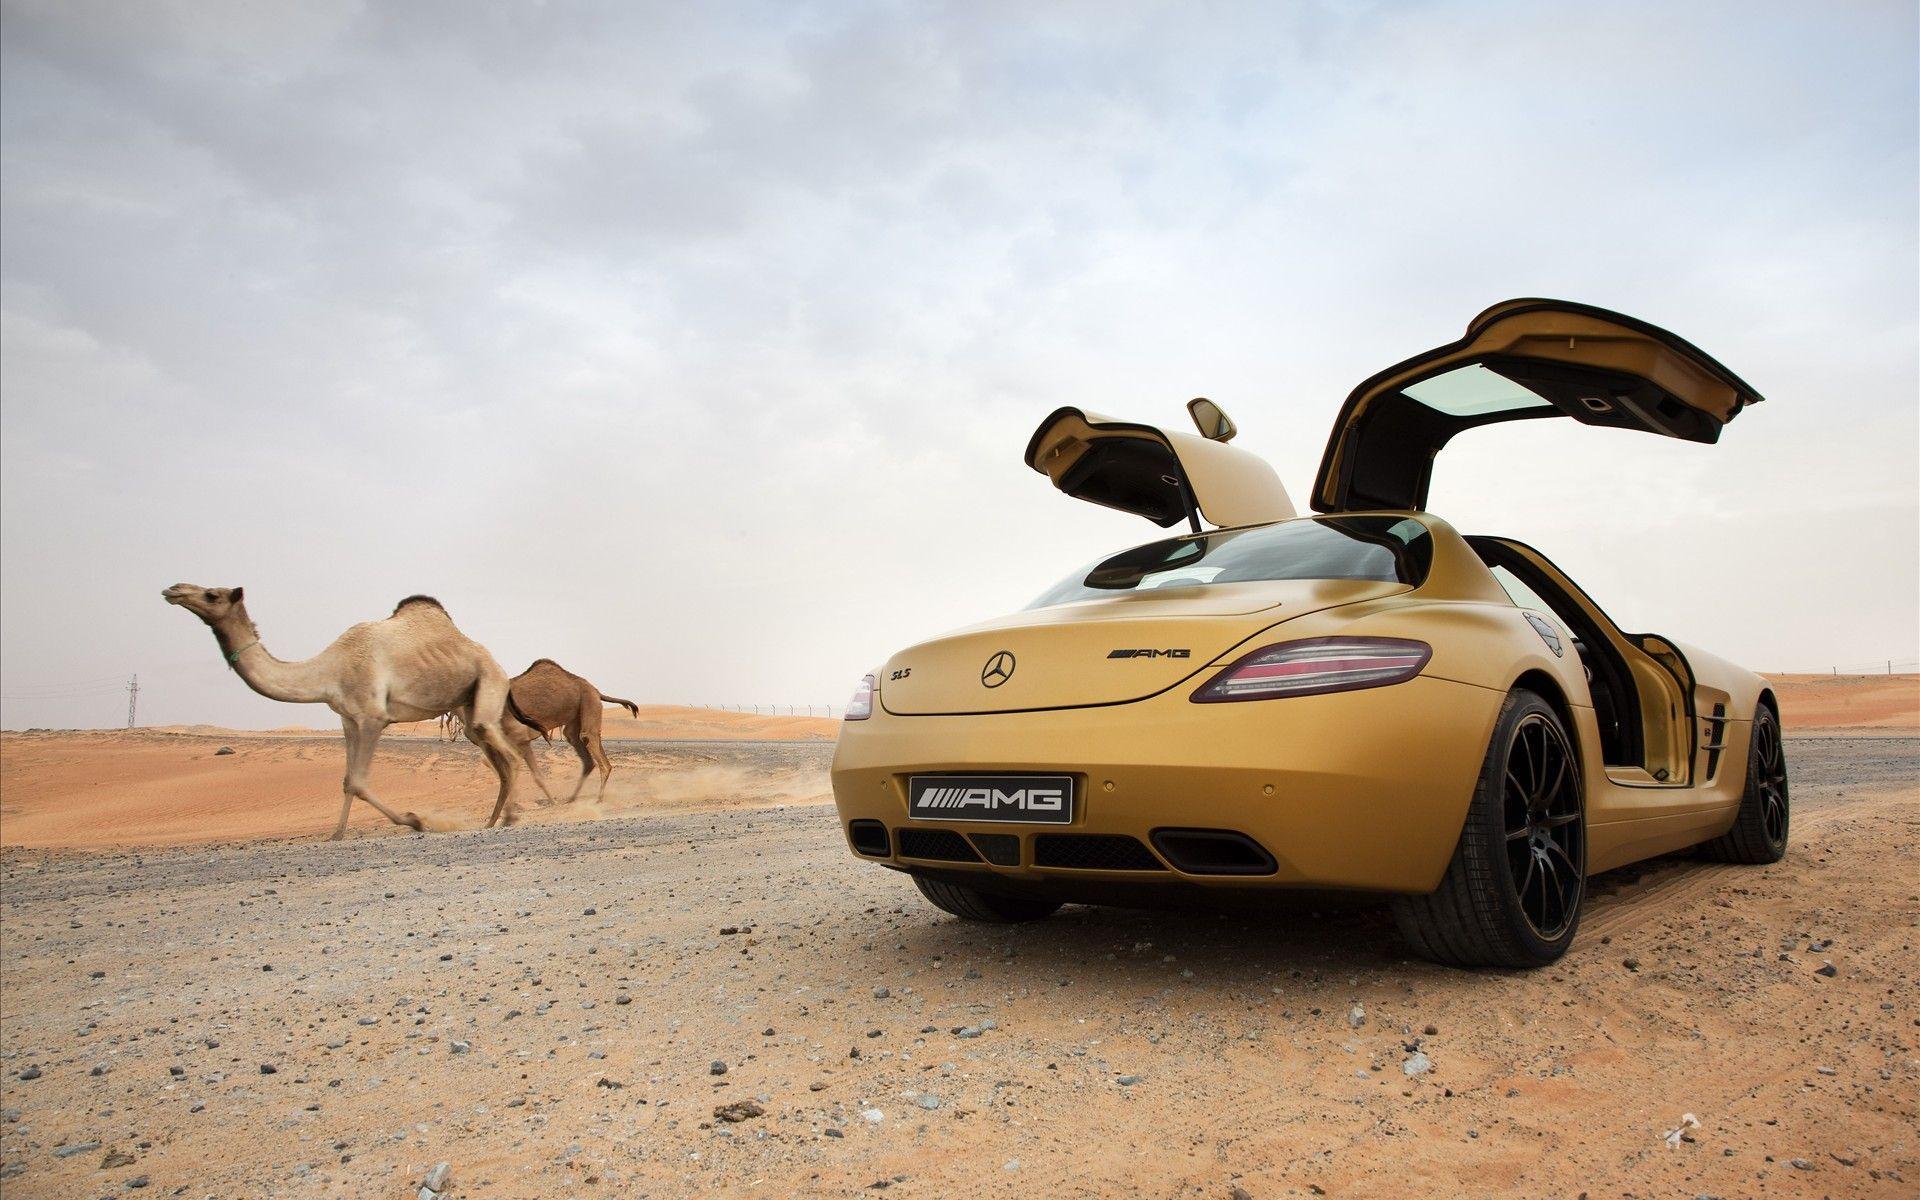 New Mercedes Benz Sls Amg Desert Gold Wallpapers Download Free